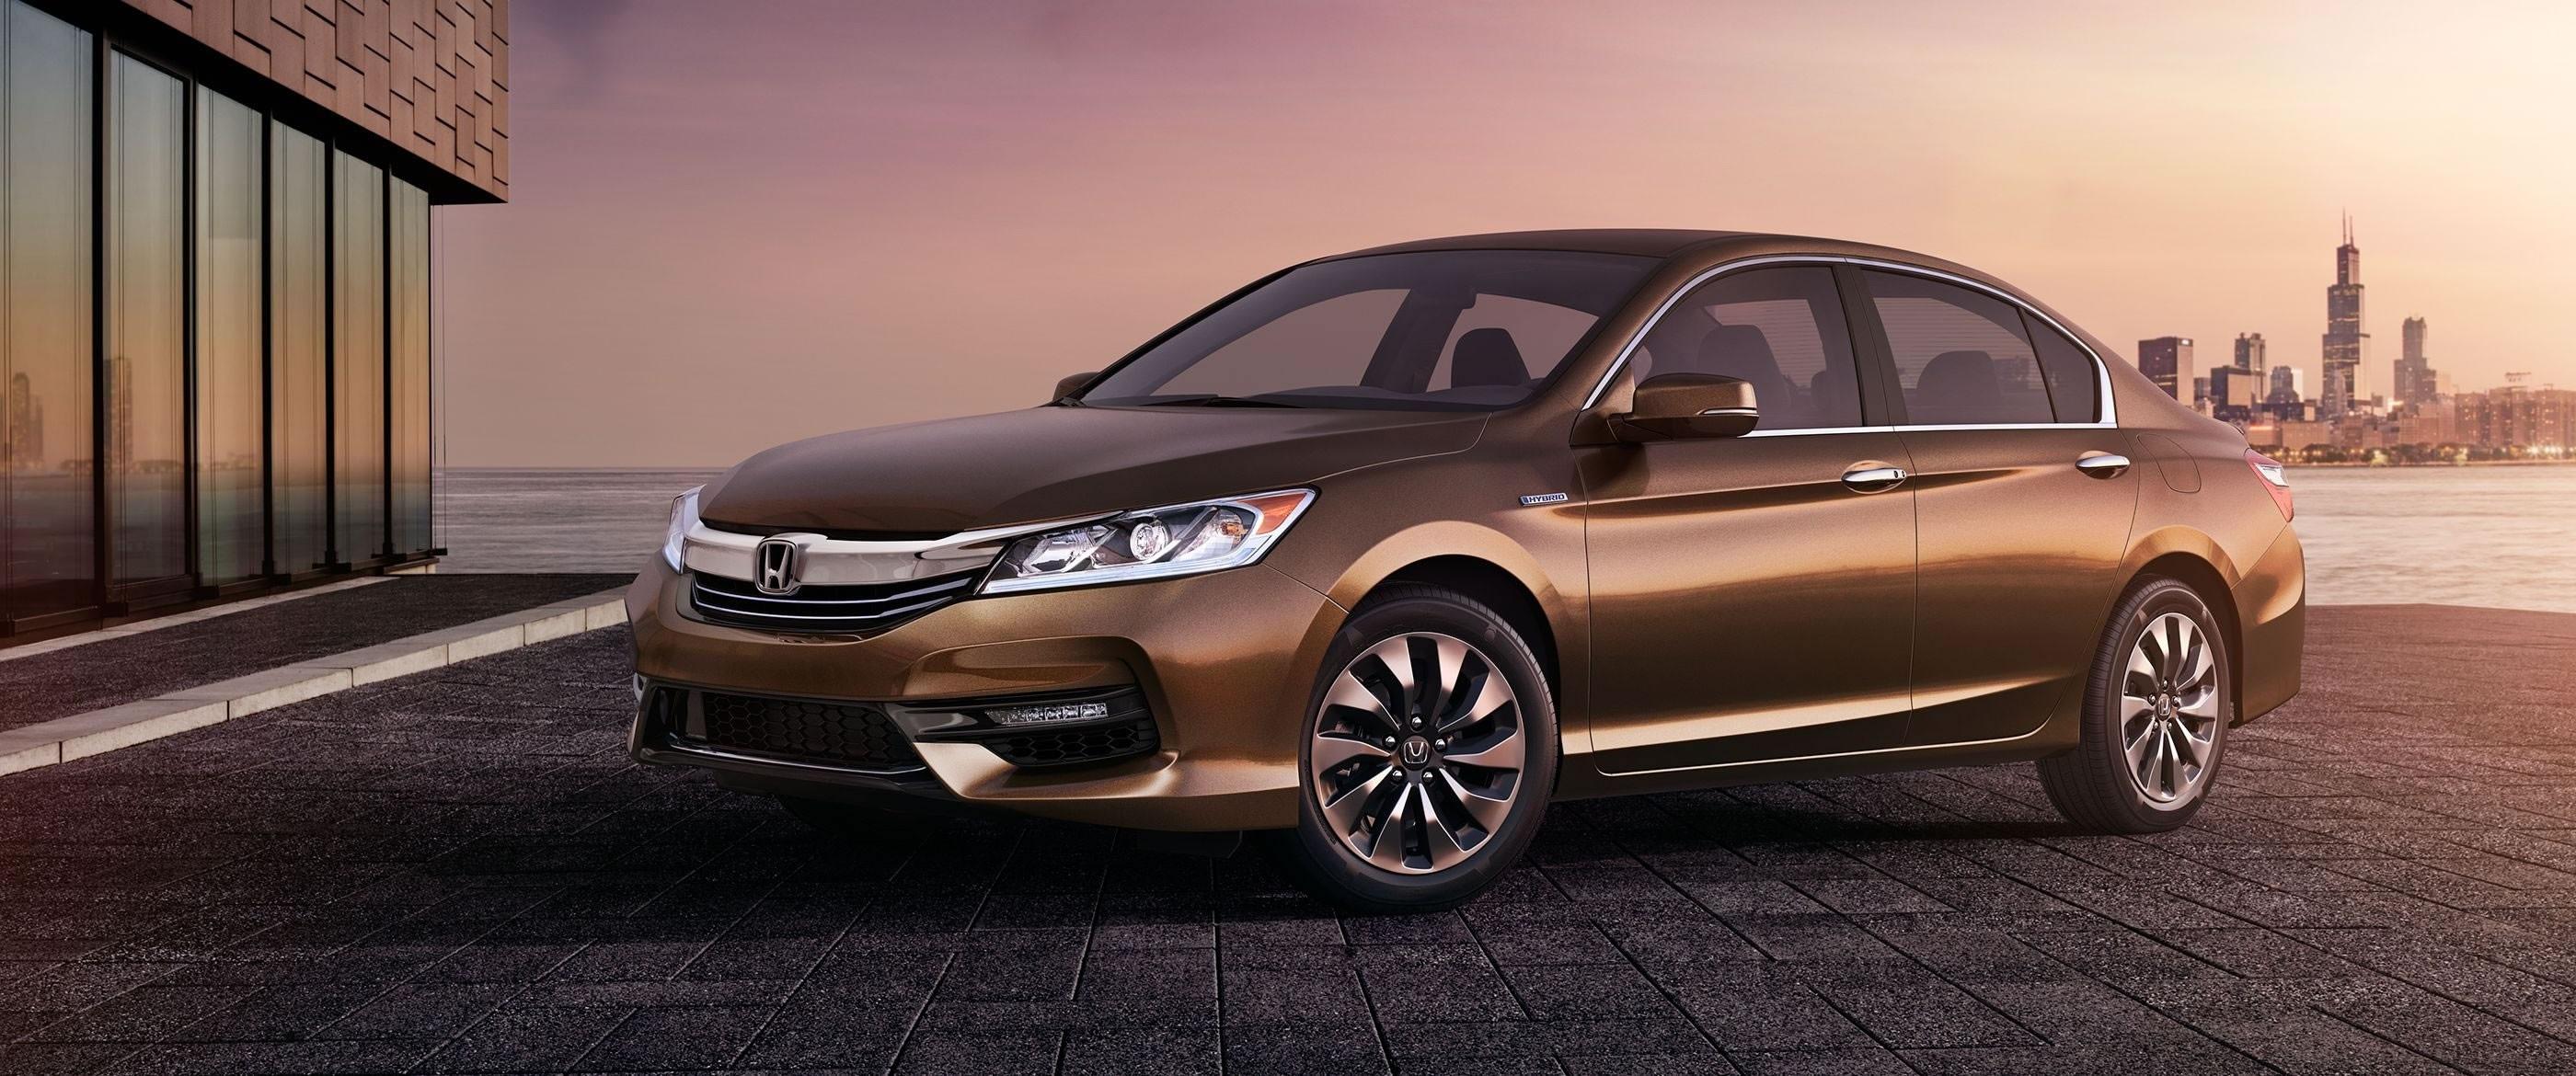 2017 Honda Accord Hybrid Brown Side Exterior